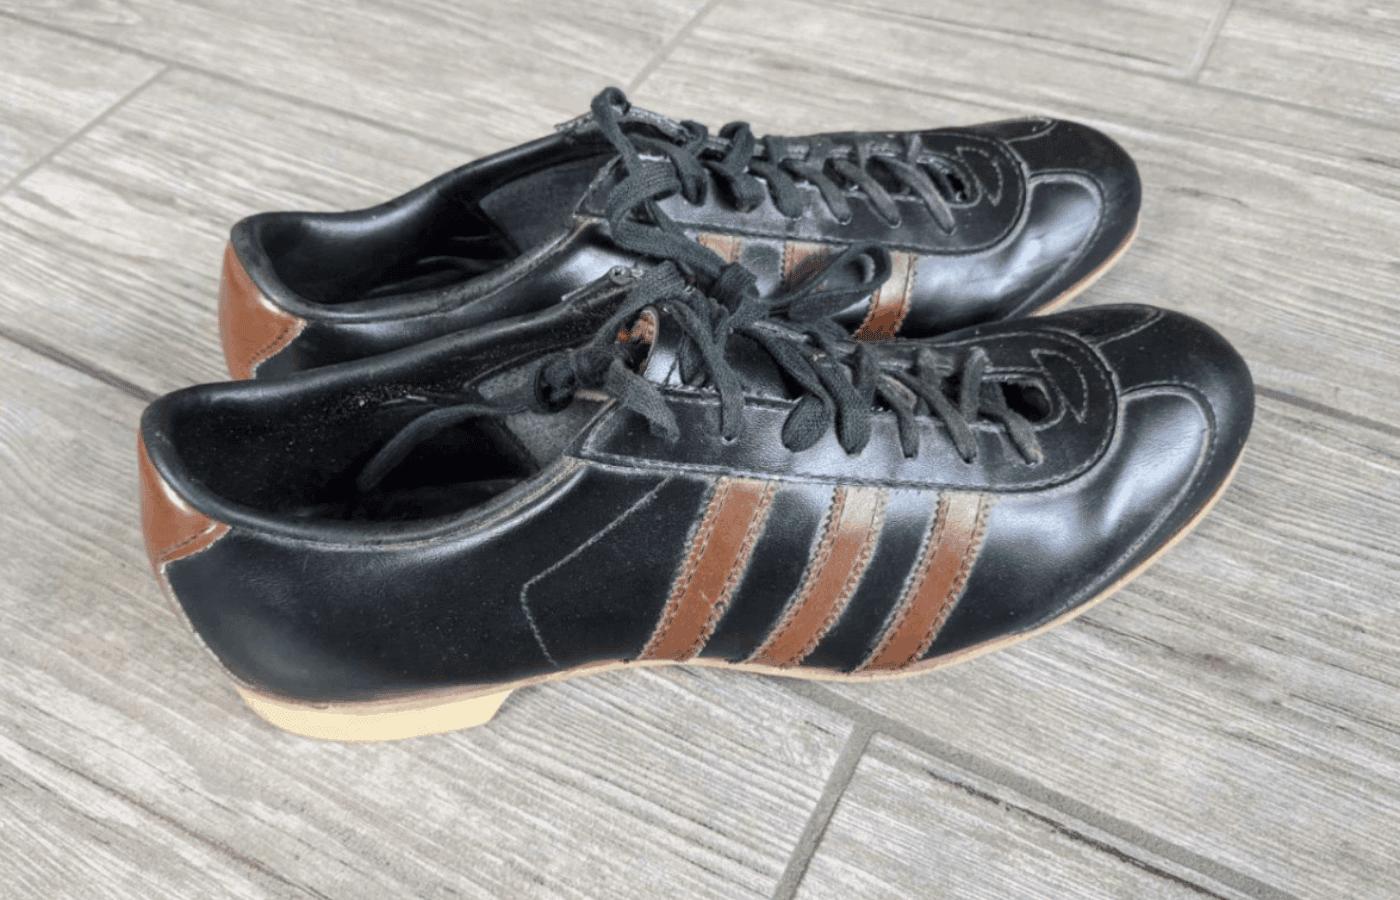 Does Adidas Make Bowling Shoes